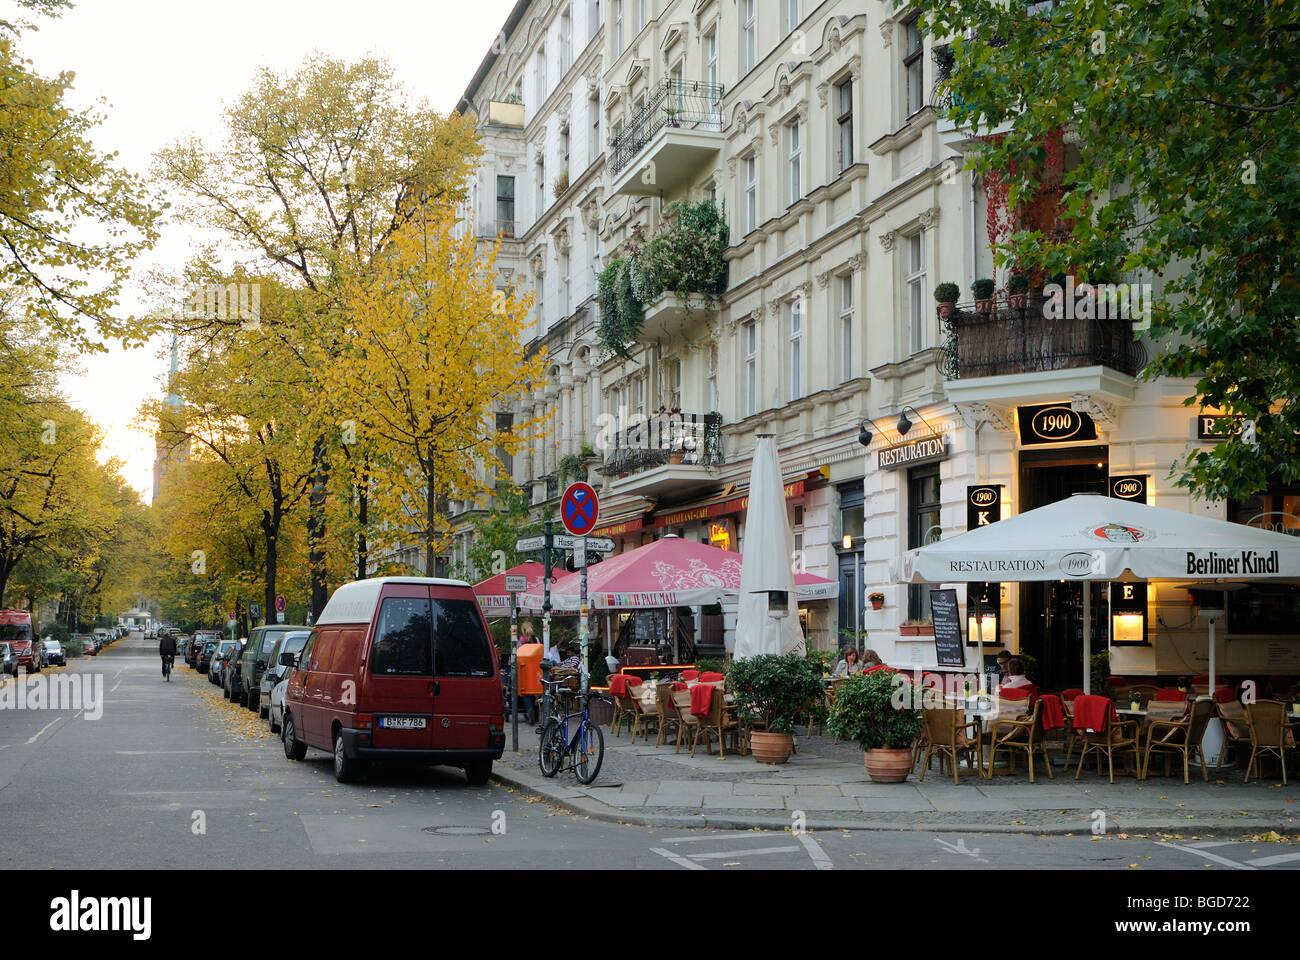 restaurant restauration 1900 am kollwitzplatz bezirk. Black Bedroom Furniture Sets. Home Design Ideas